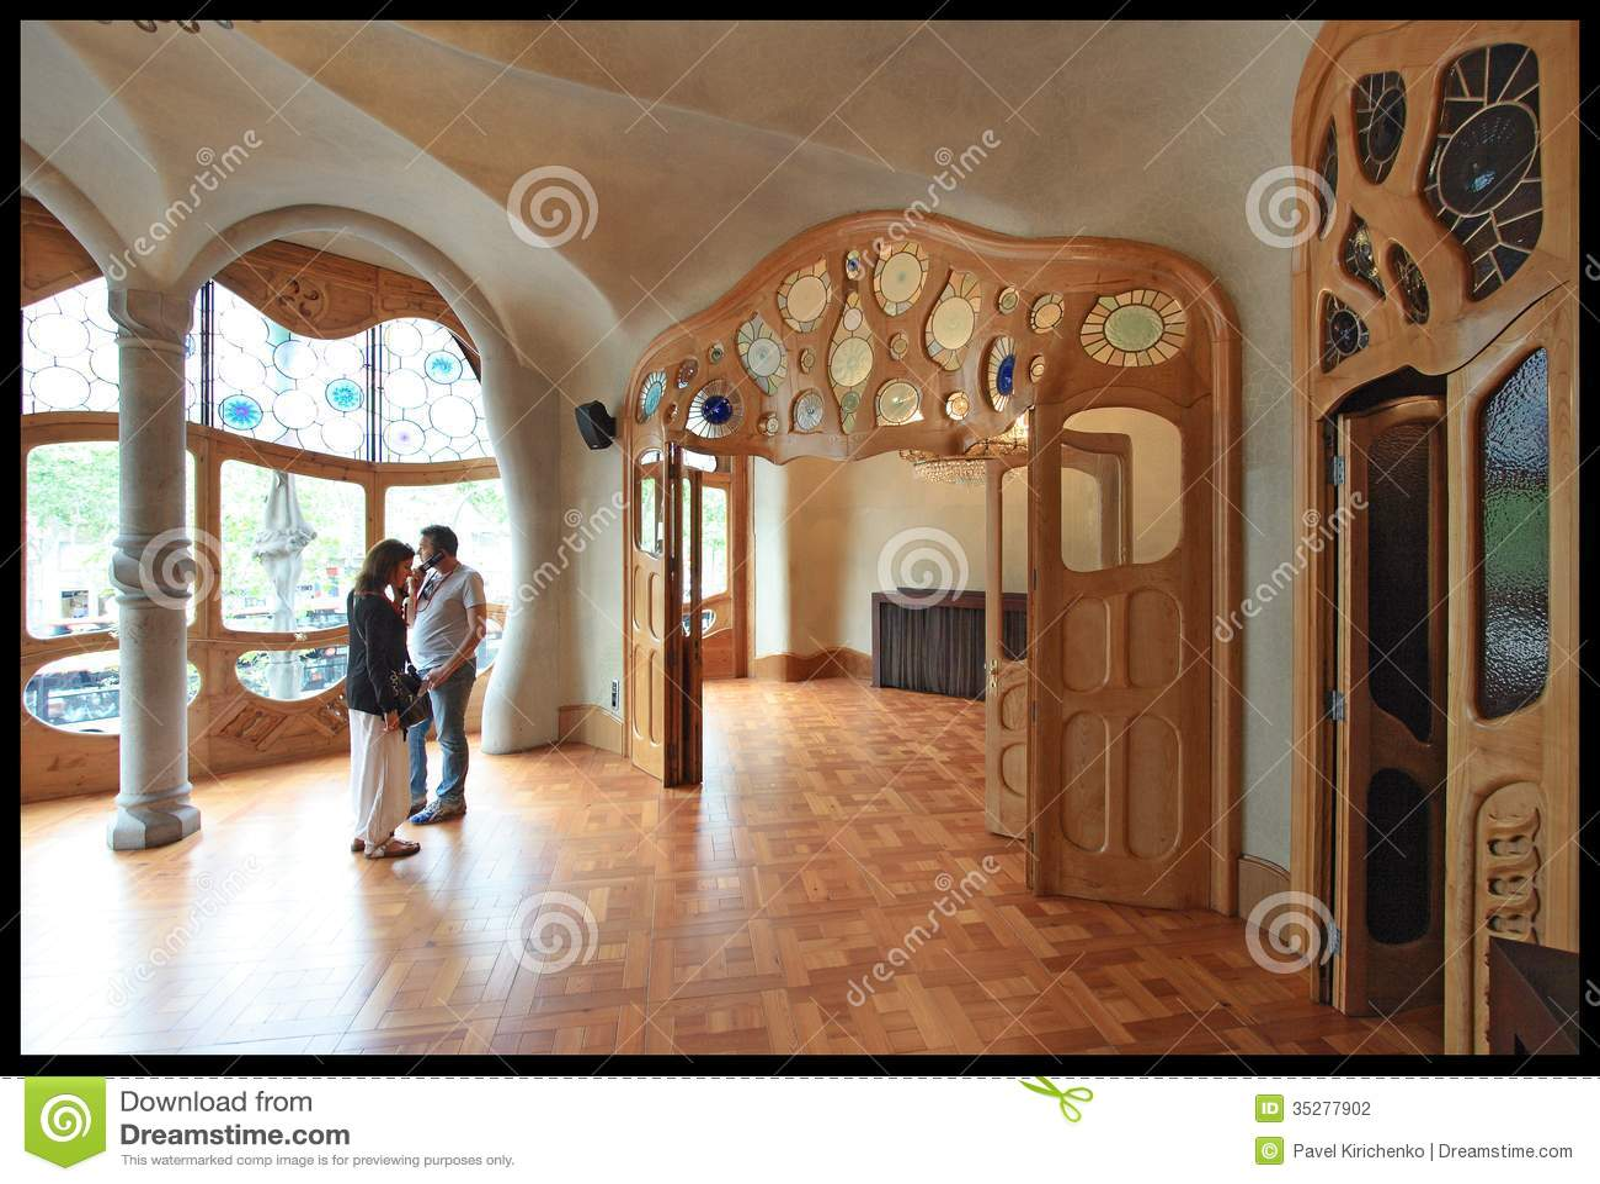 gaudi house interior - photo #16